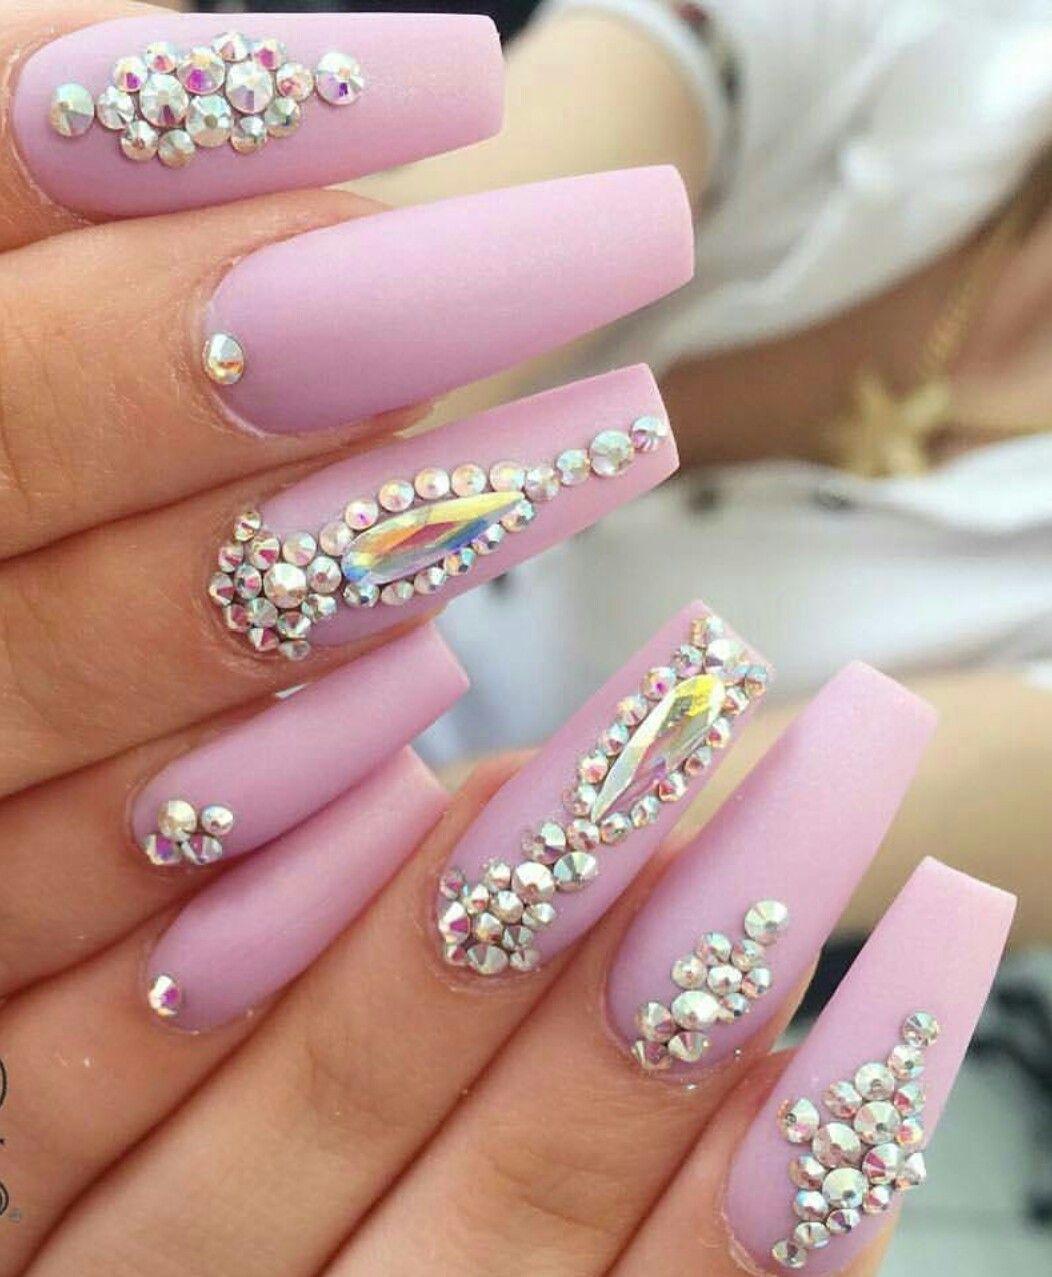 yakelin nails - lavender pastel